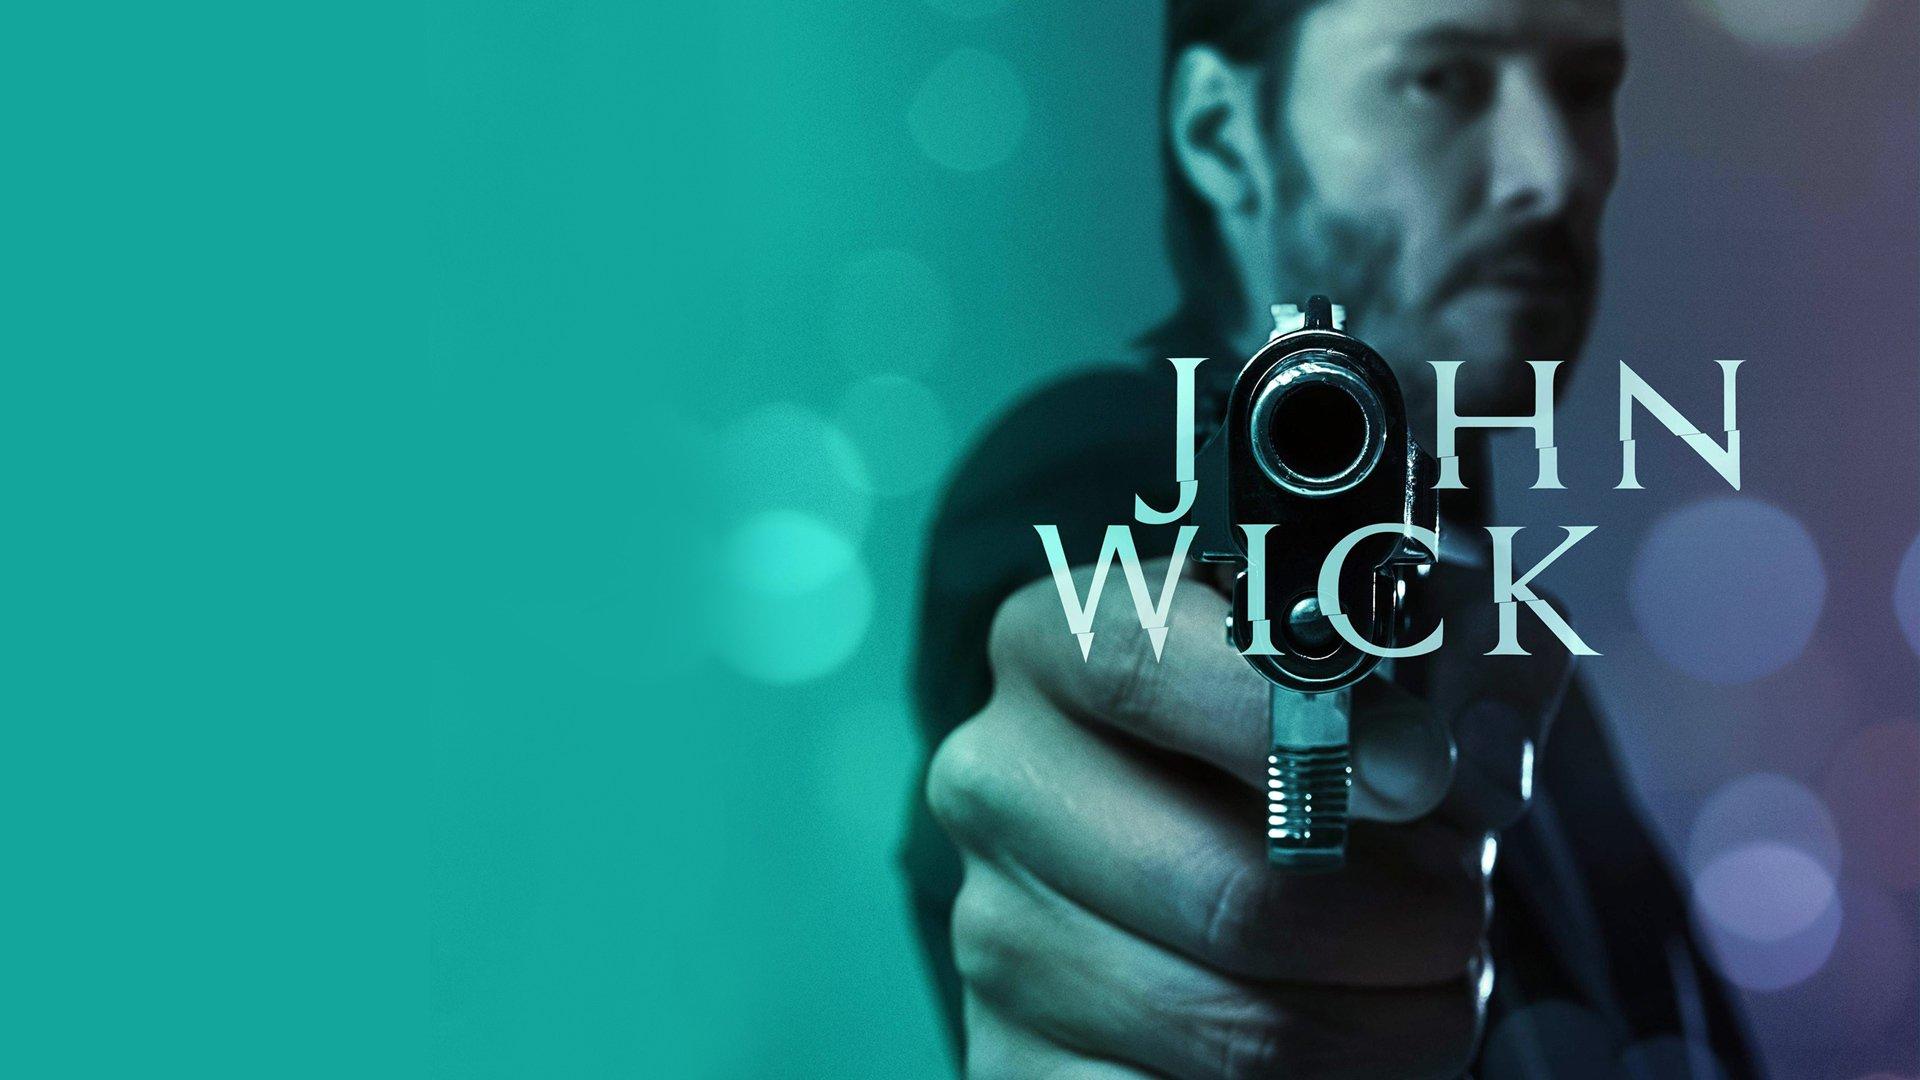 John Wick Chapter 2 Hd Watch John Wick Chapter 2 2017 Full Hd